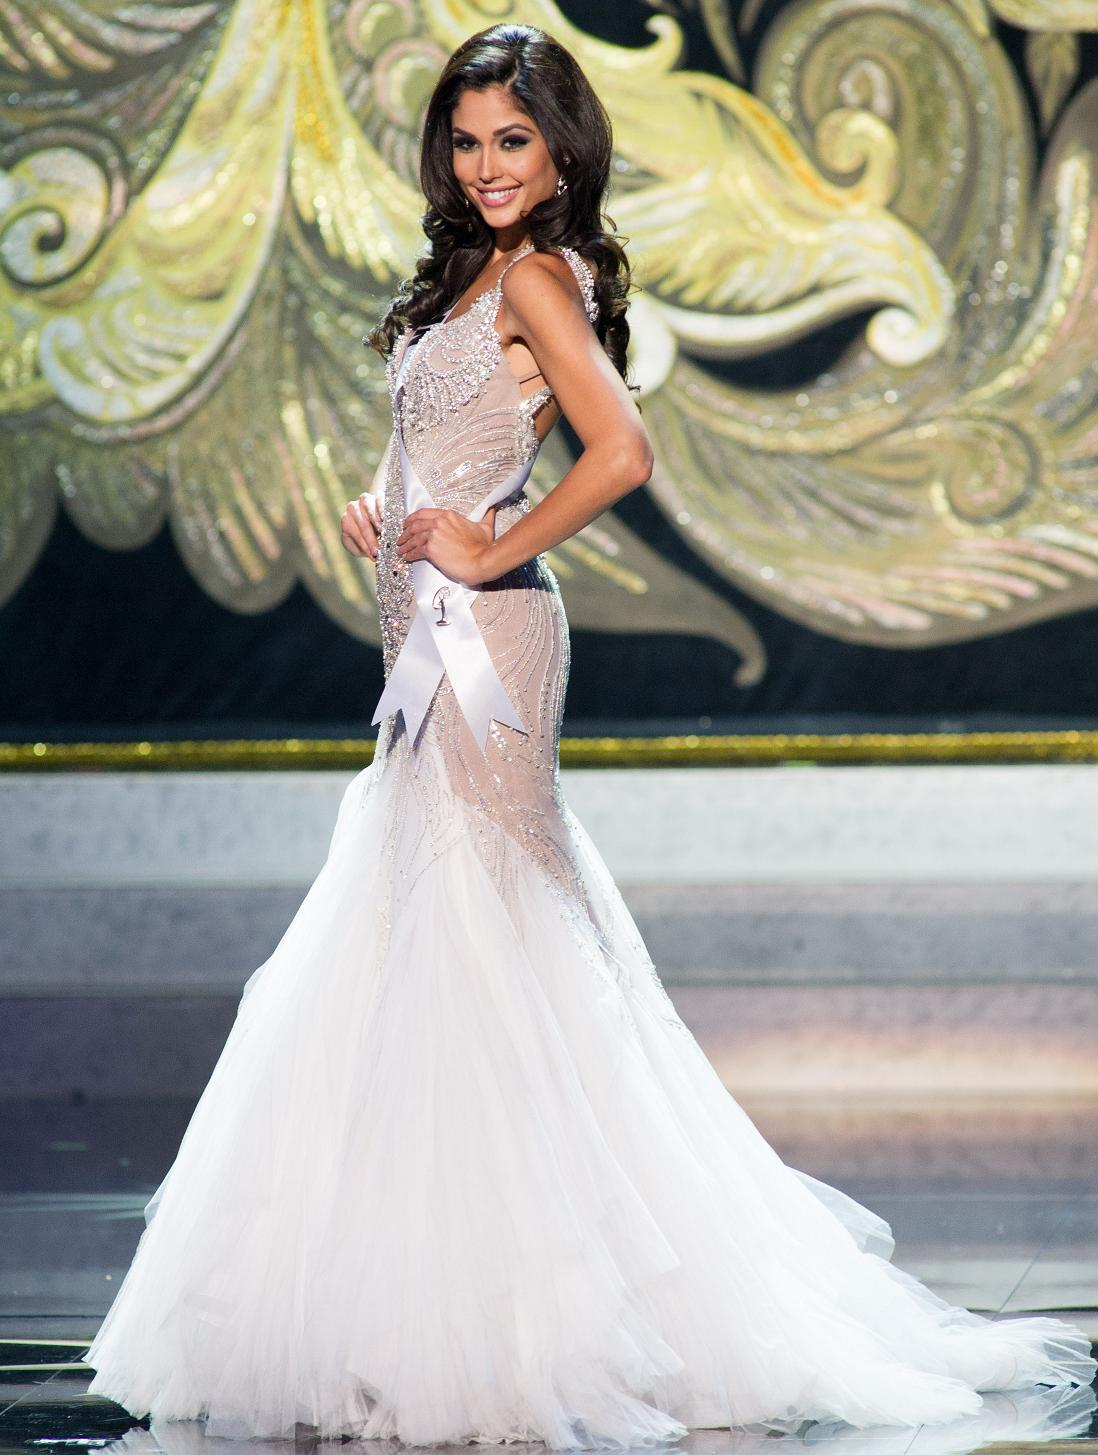 patricia yurena rodriguez, miss espana 2008/2013, 1st runner-up de miss universe 2013. - Página 3 1098fu10